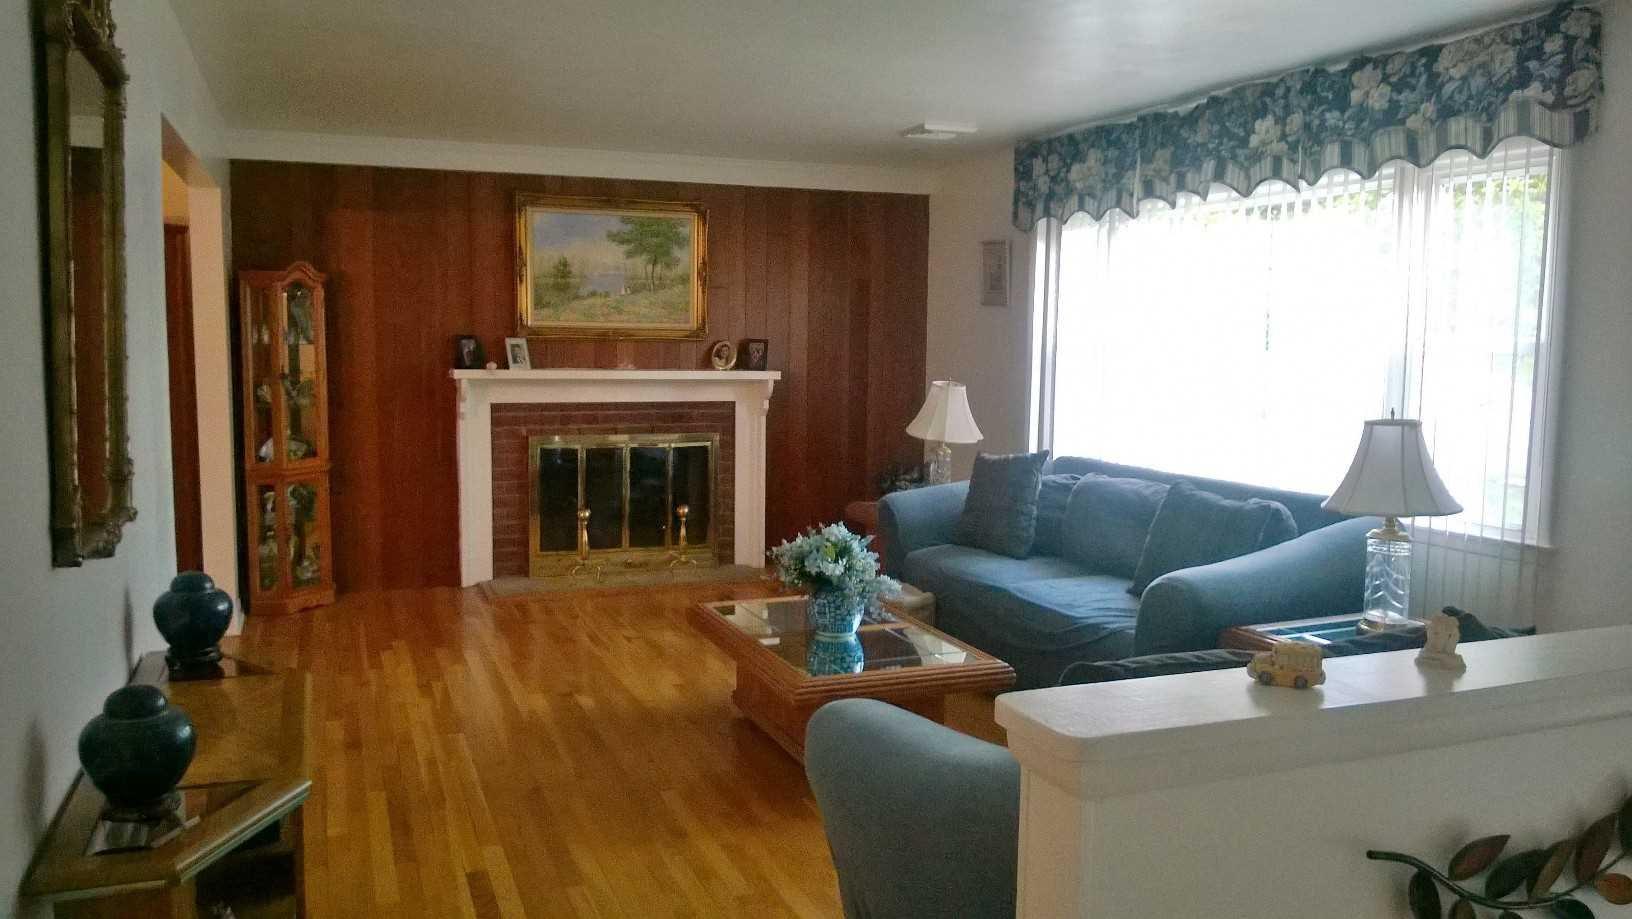 24 Gold Road, Wappingers Falls, NY 12590